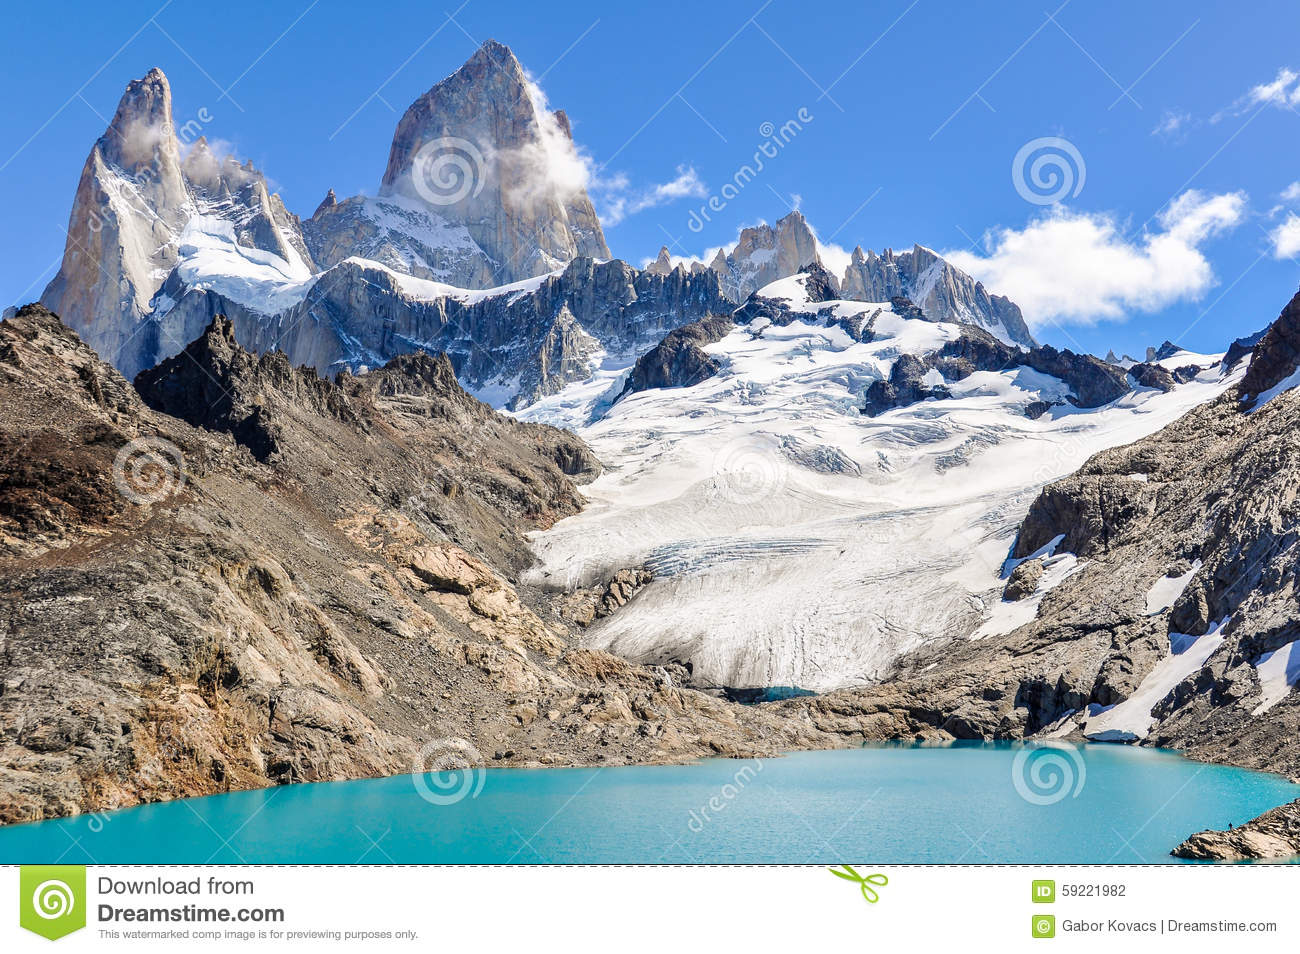 Lagoon, Fitz Roy, El Chalten, Argentina Stock Photo.